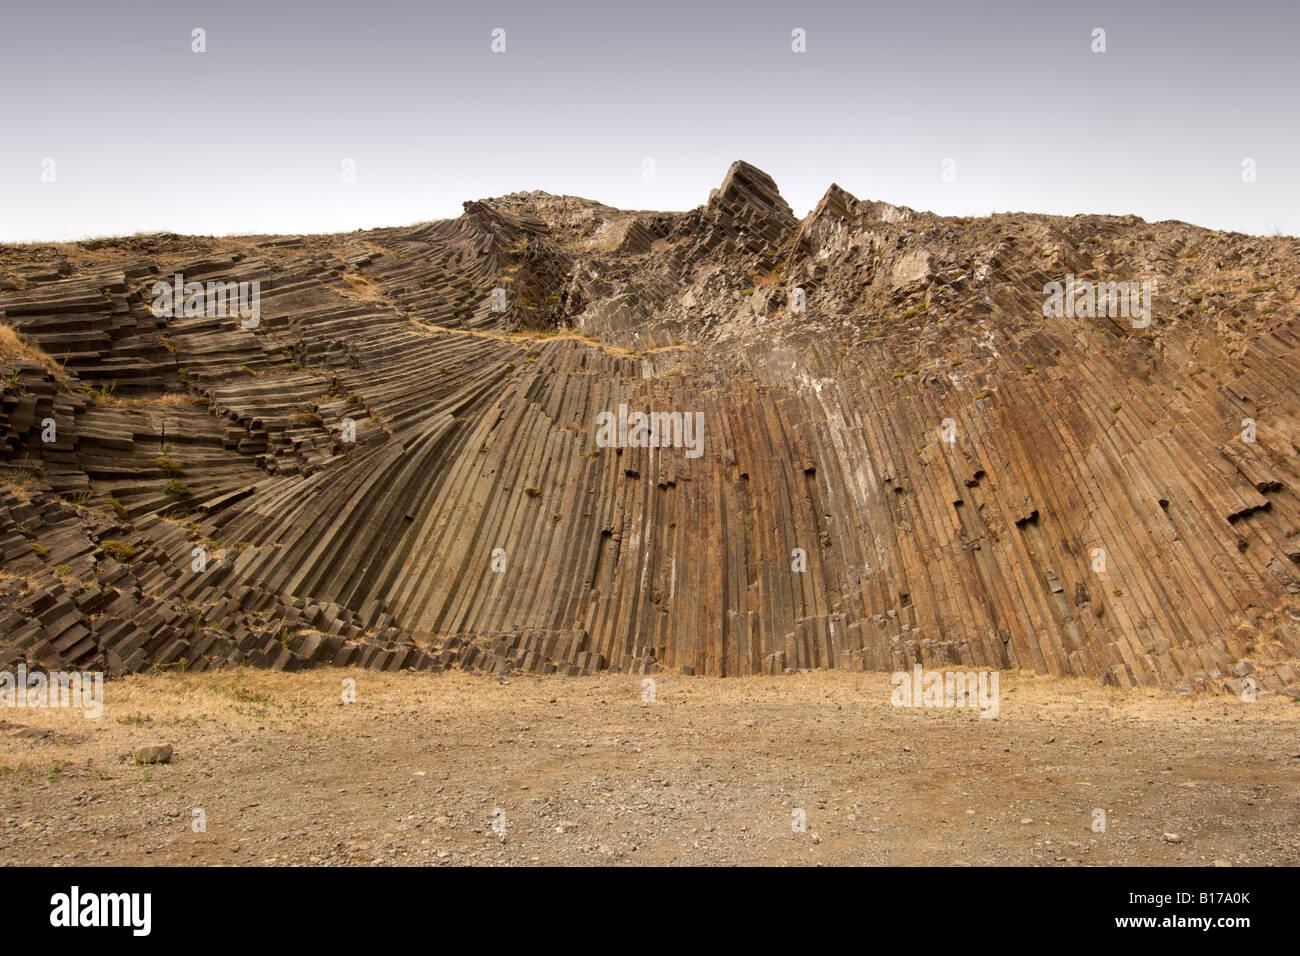 Pentagonal rock extrusions on Pico de Ana Ferreira on the Portuguese Atlantic island of Porto Santo. - Stock Image